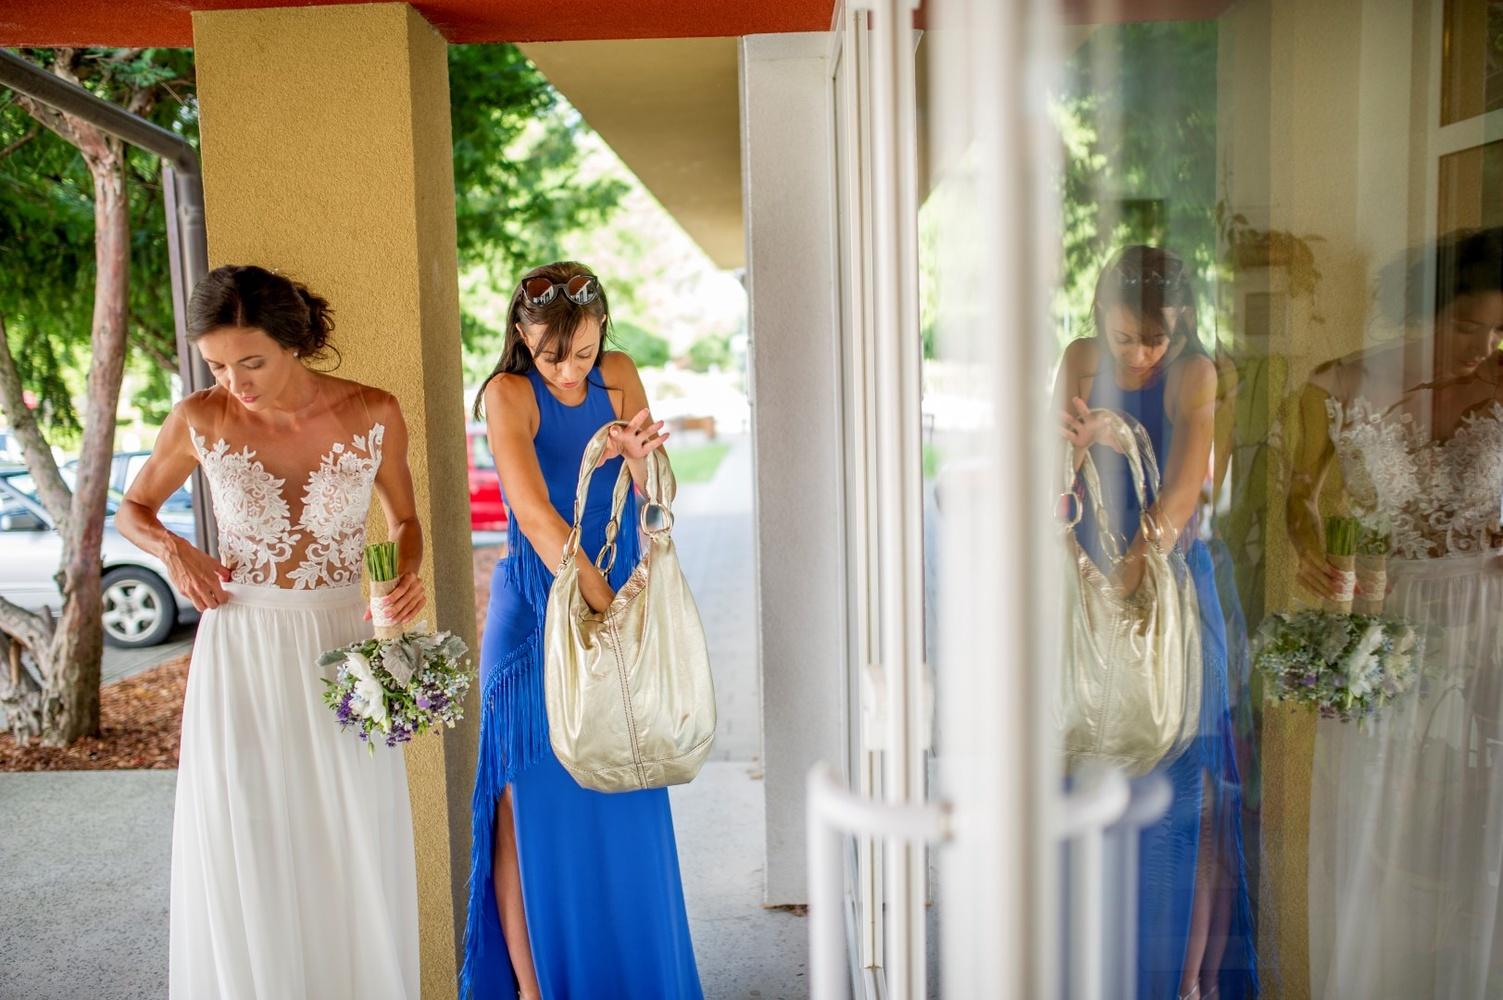 http://www.fotoz.sk/images/gallery-10/normal/eskuvoi-fotozas_svadobne-fotenie_636.jpg